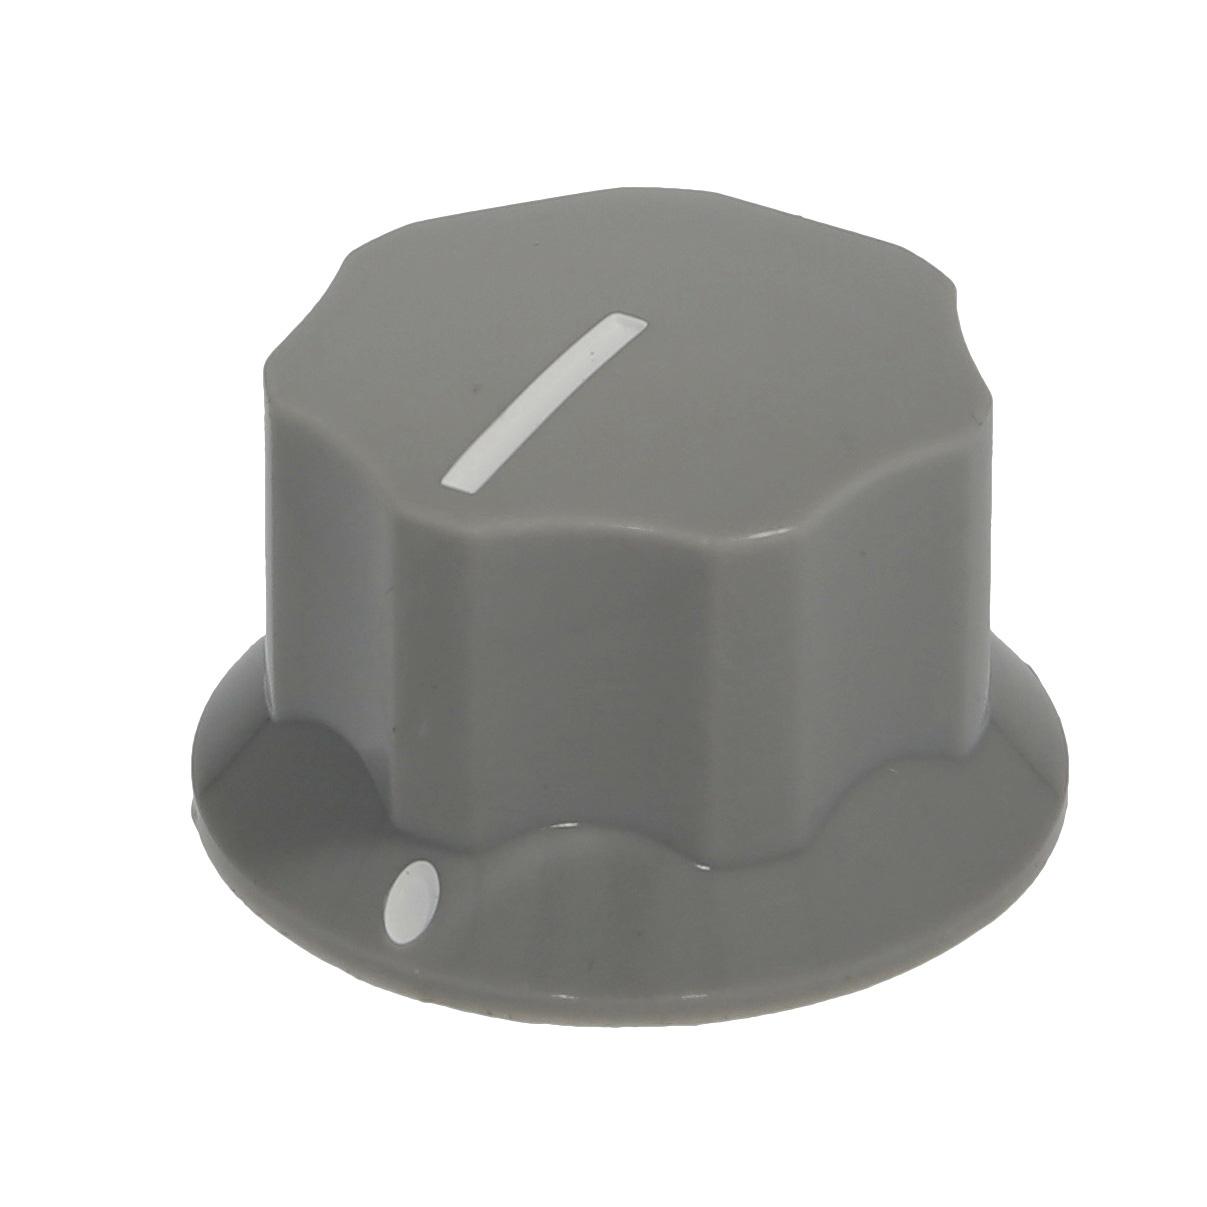 Eagle knob 25mm Gray